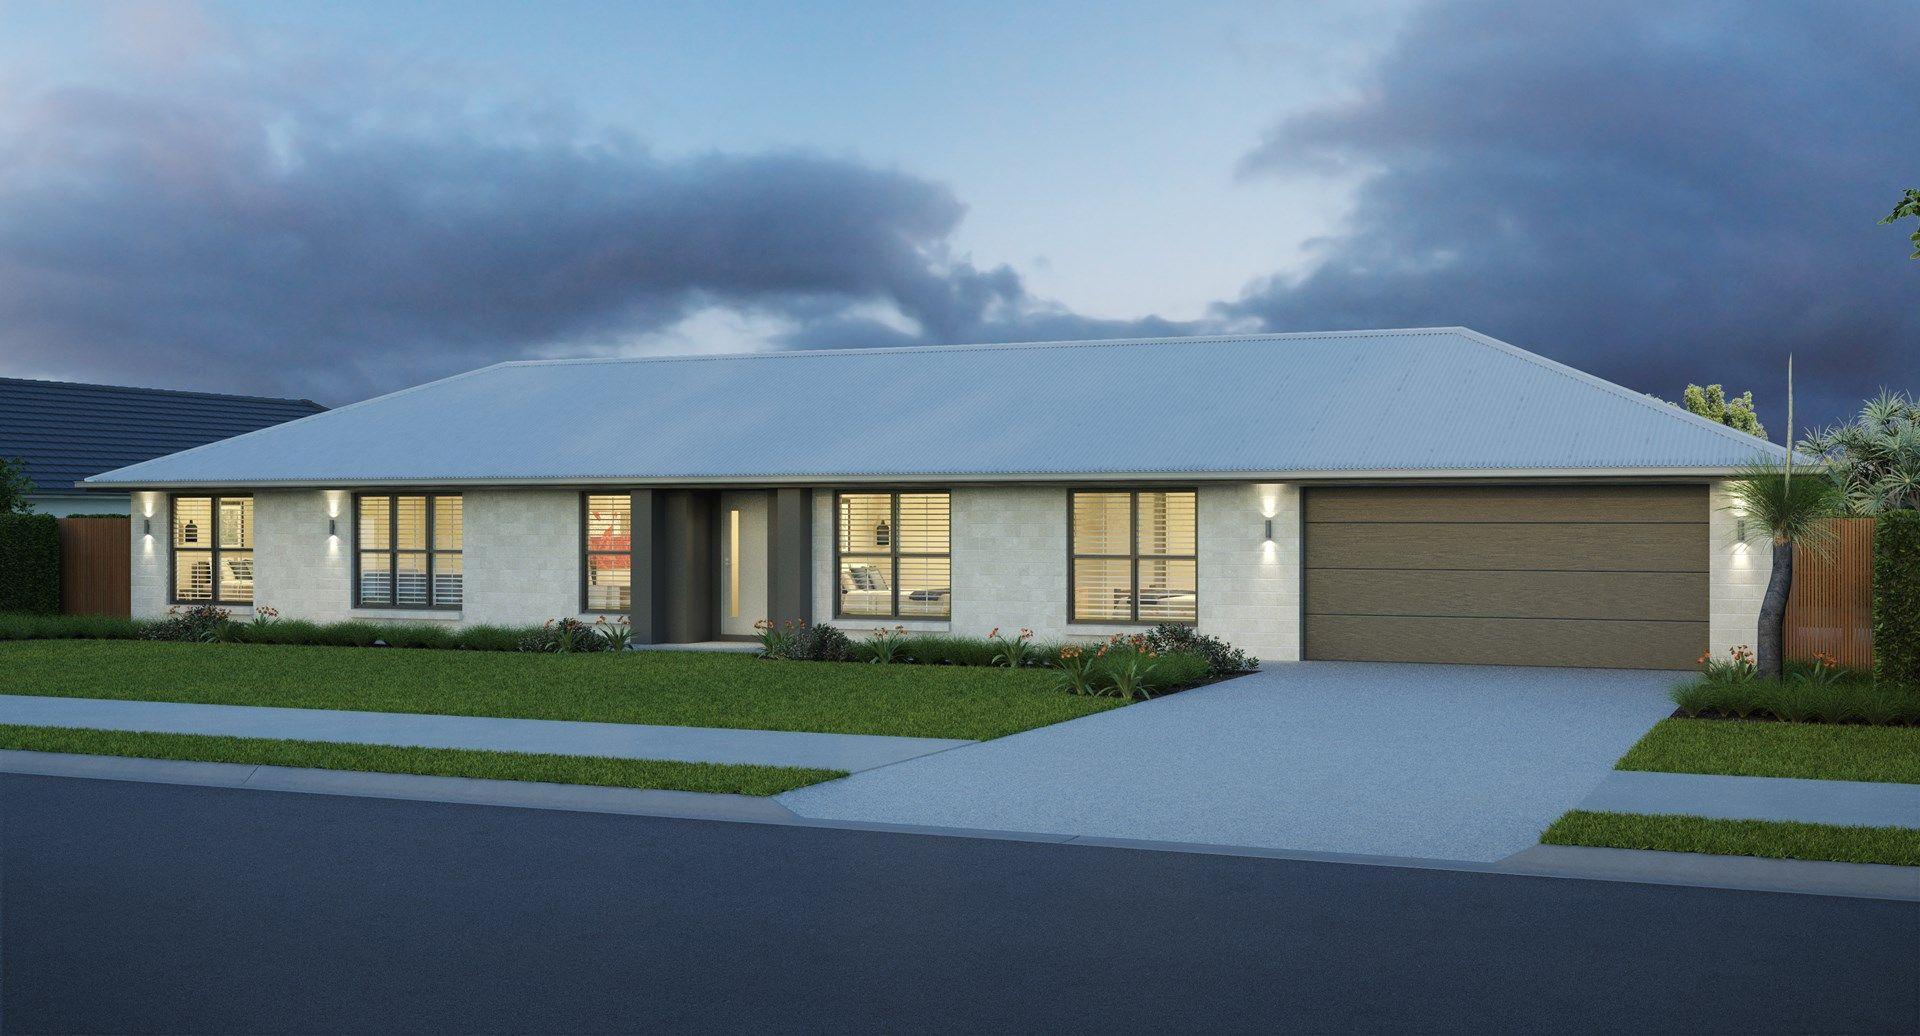 Lot 18 Placid Drive, Gatton QLD 4343, Image 0